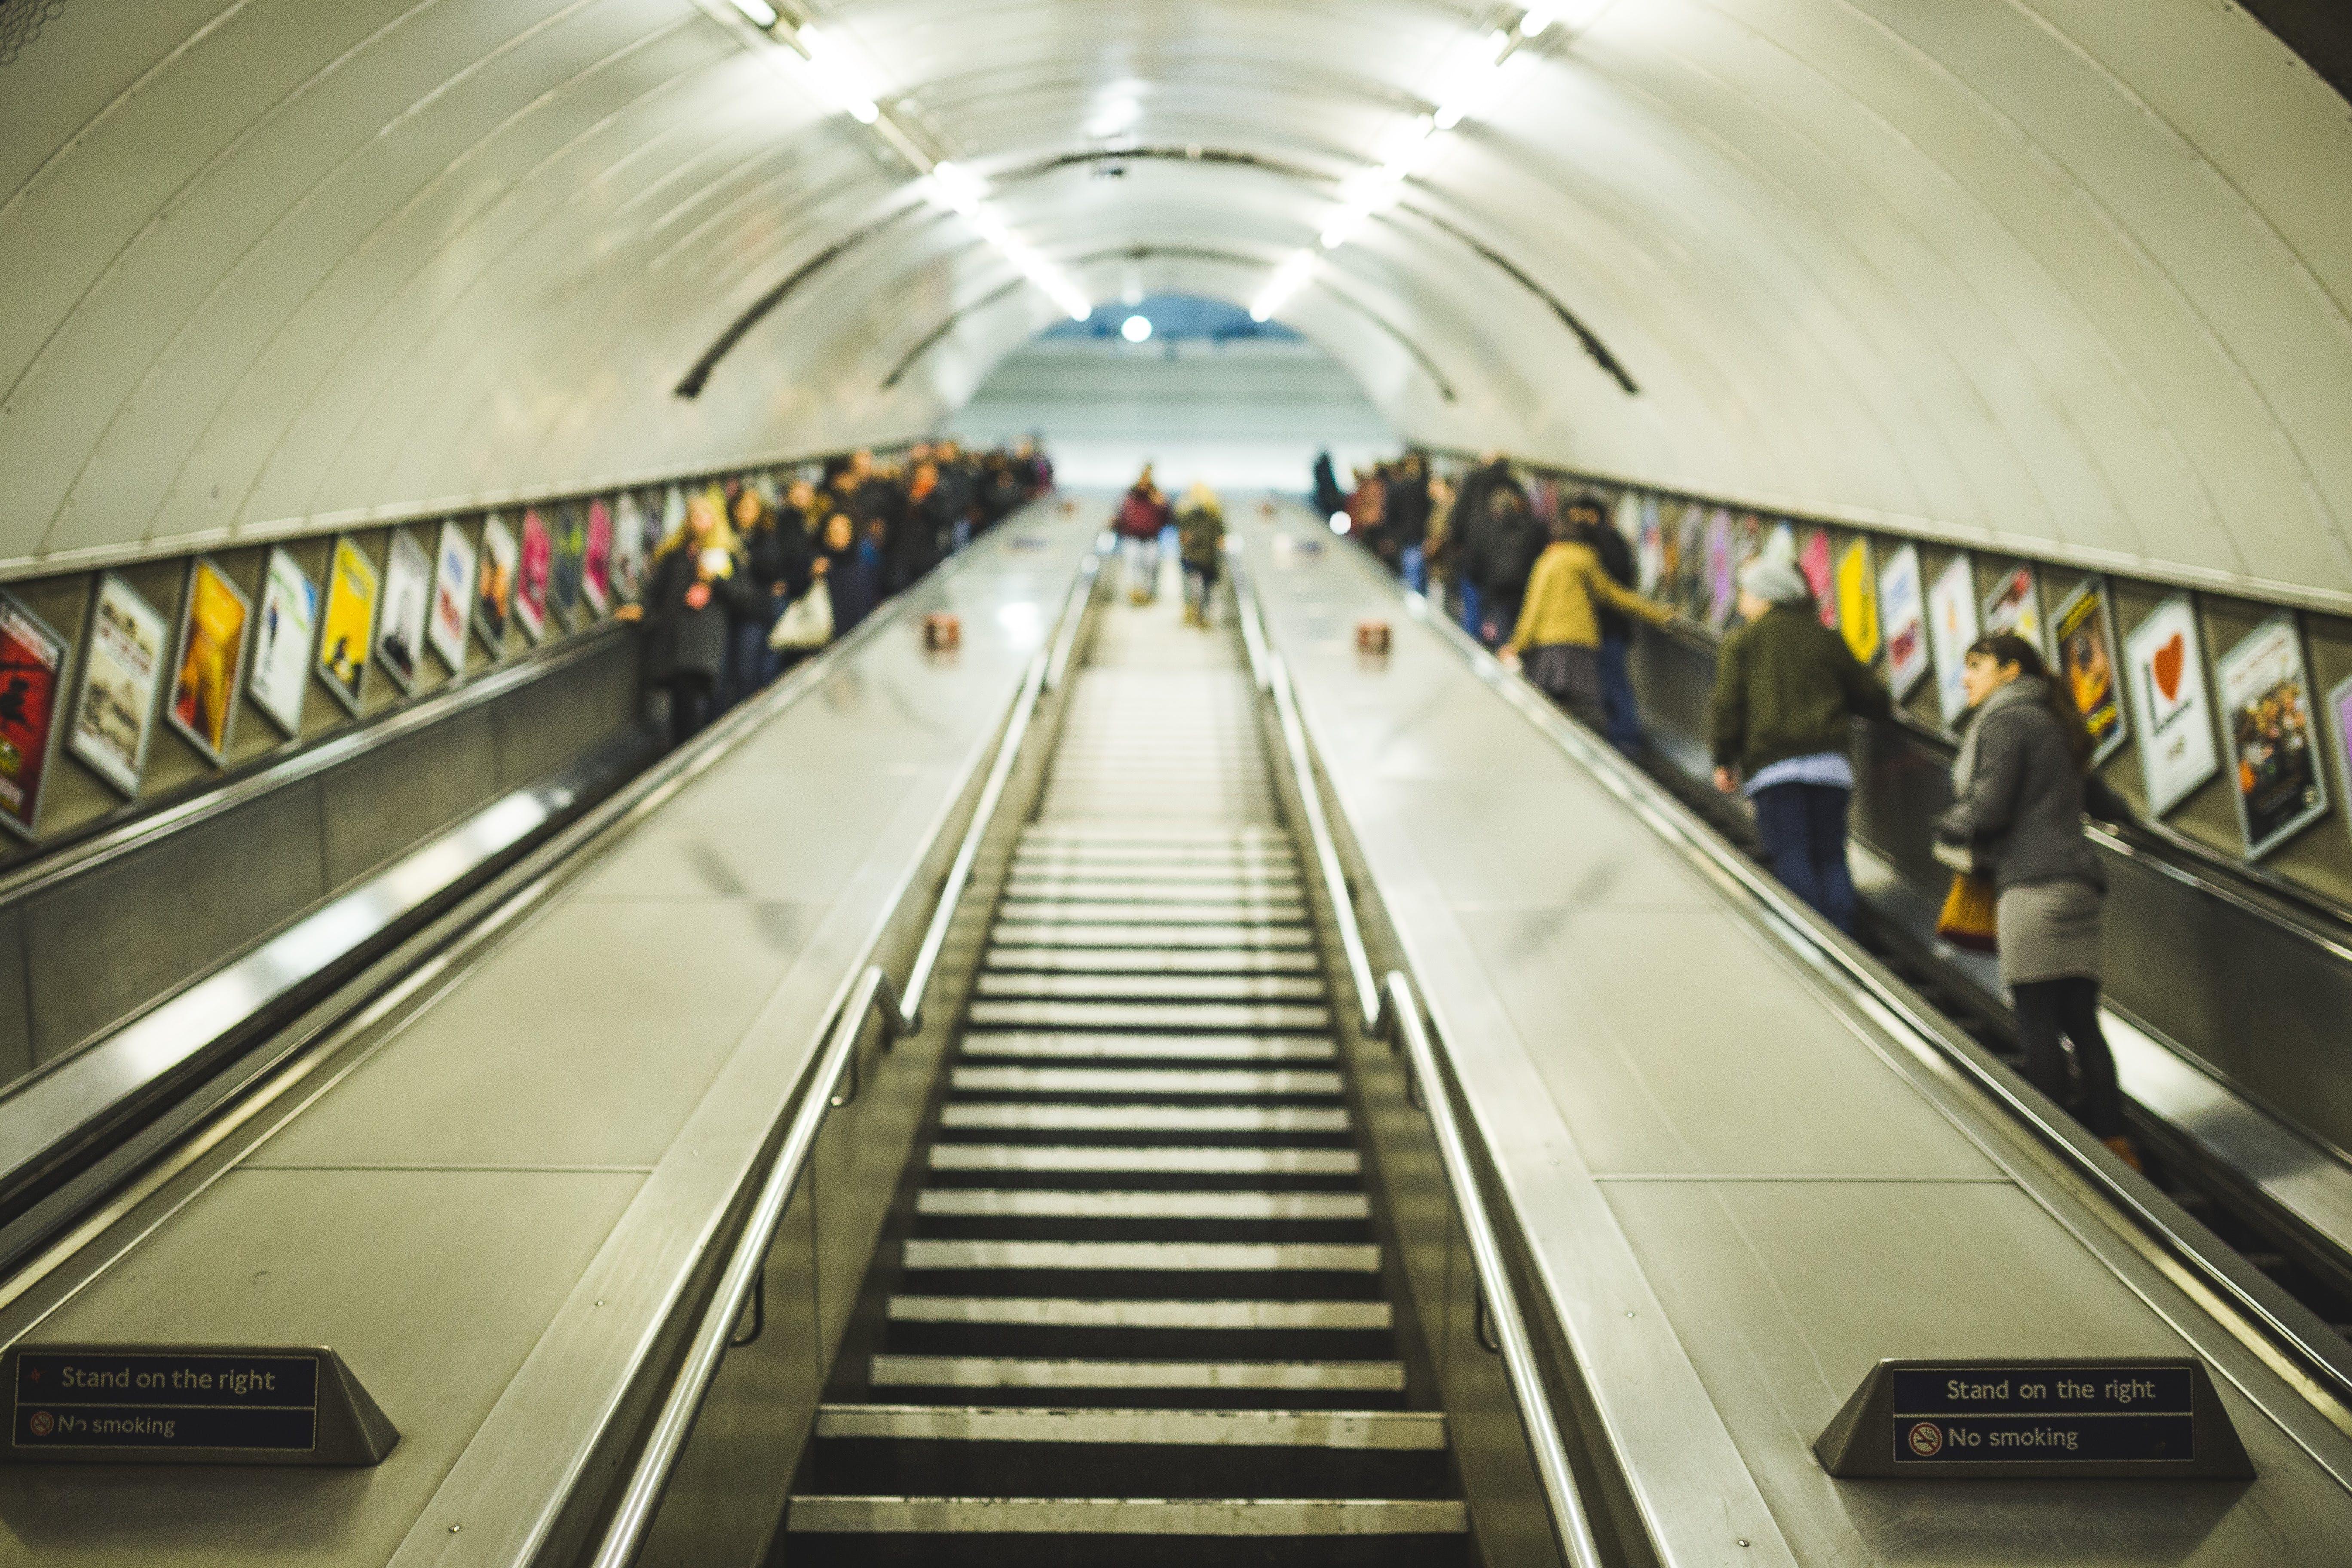 People Standing on Escalators Inside Tunnel